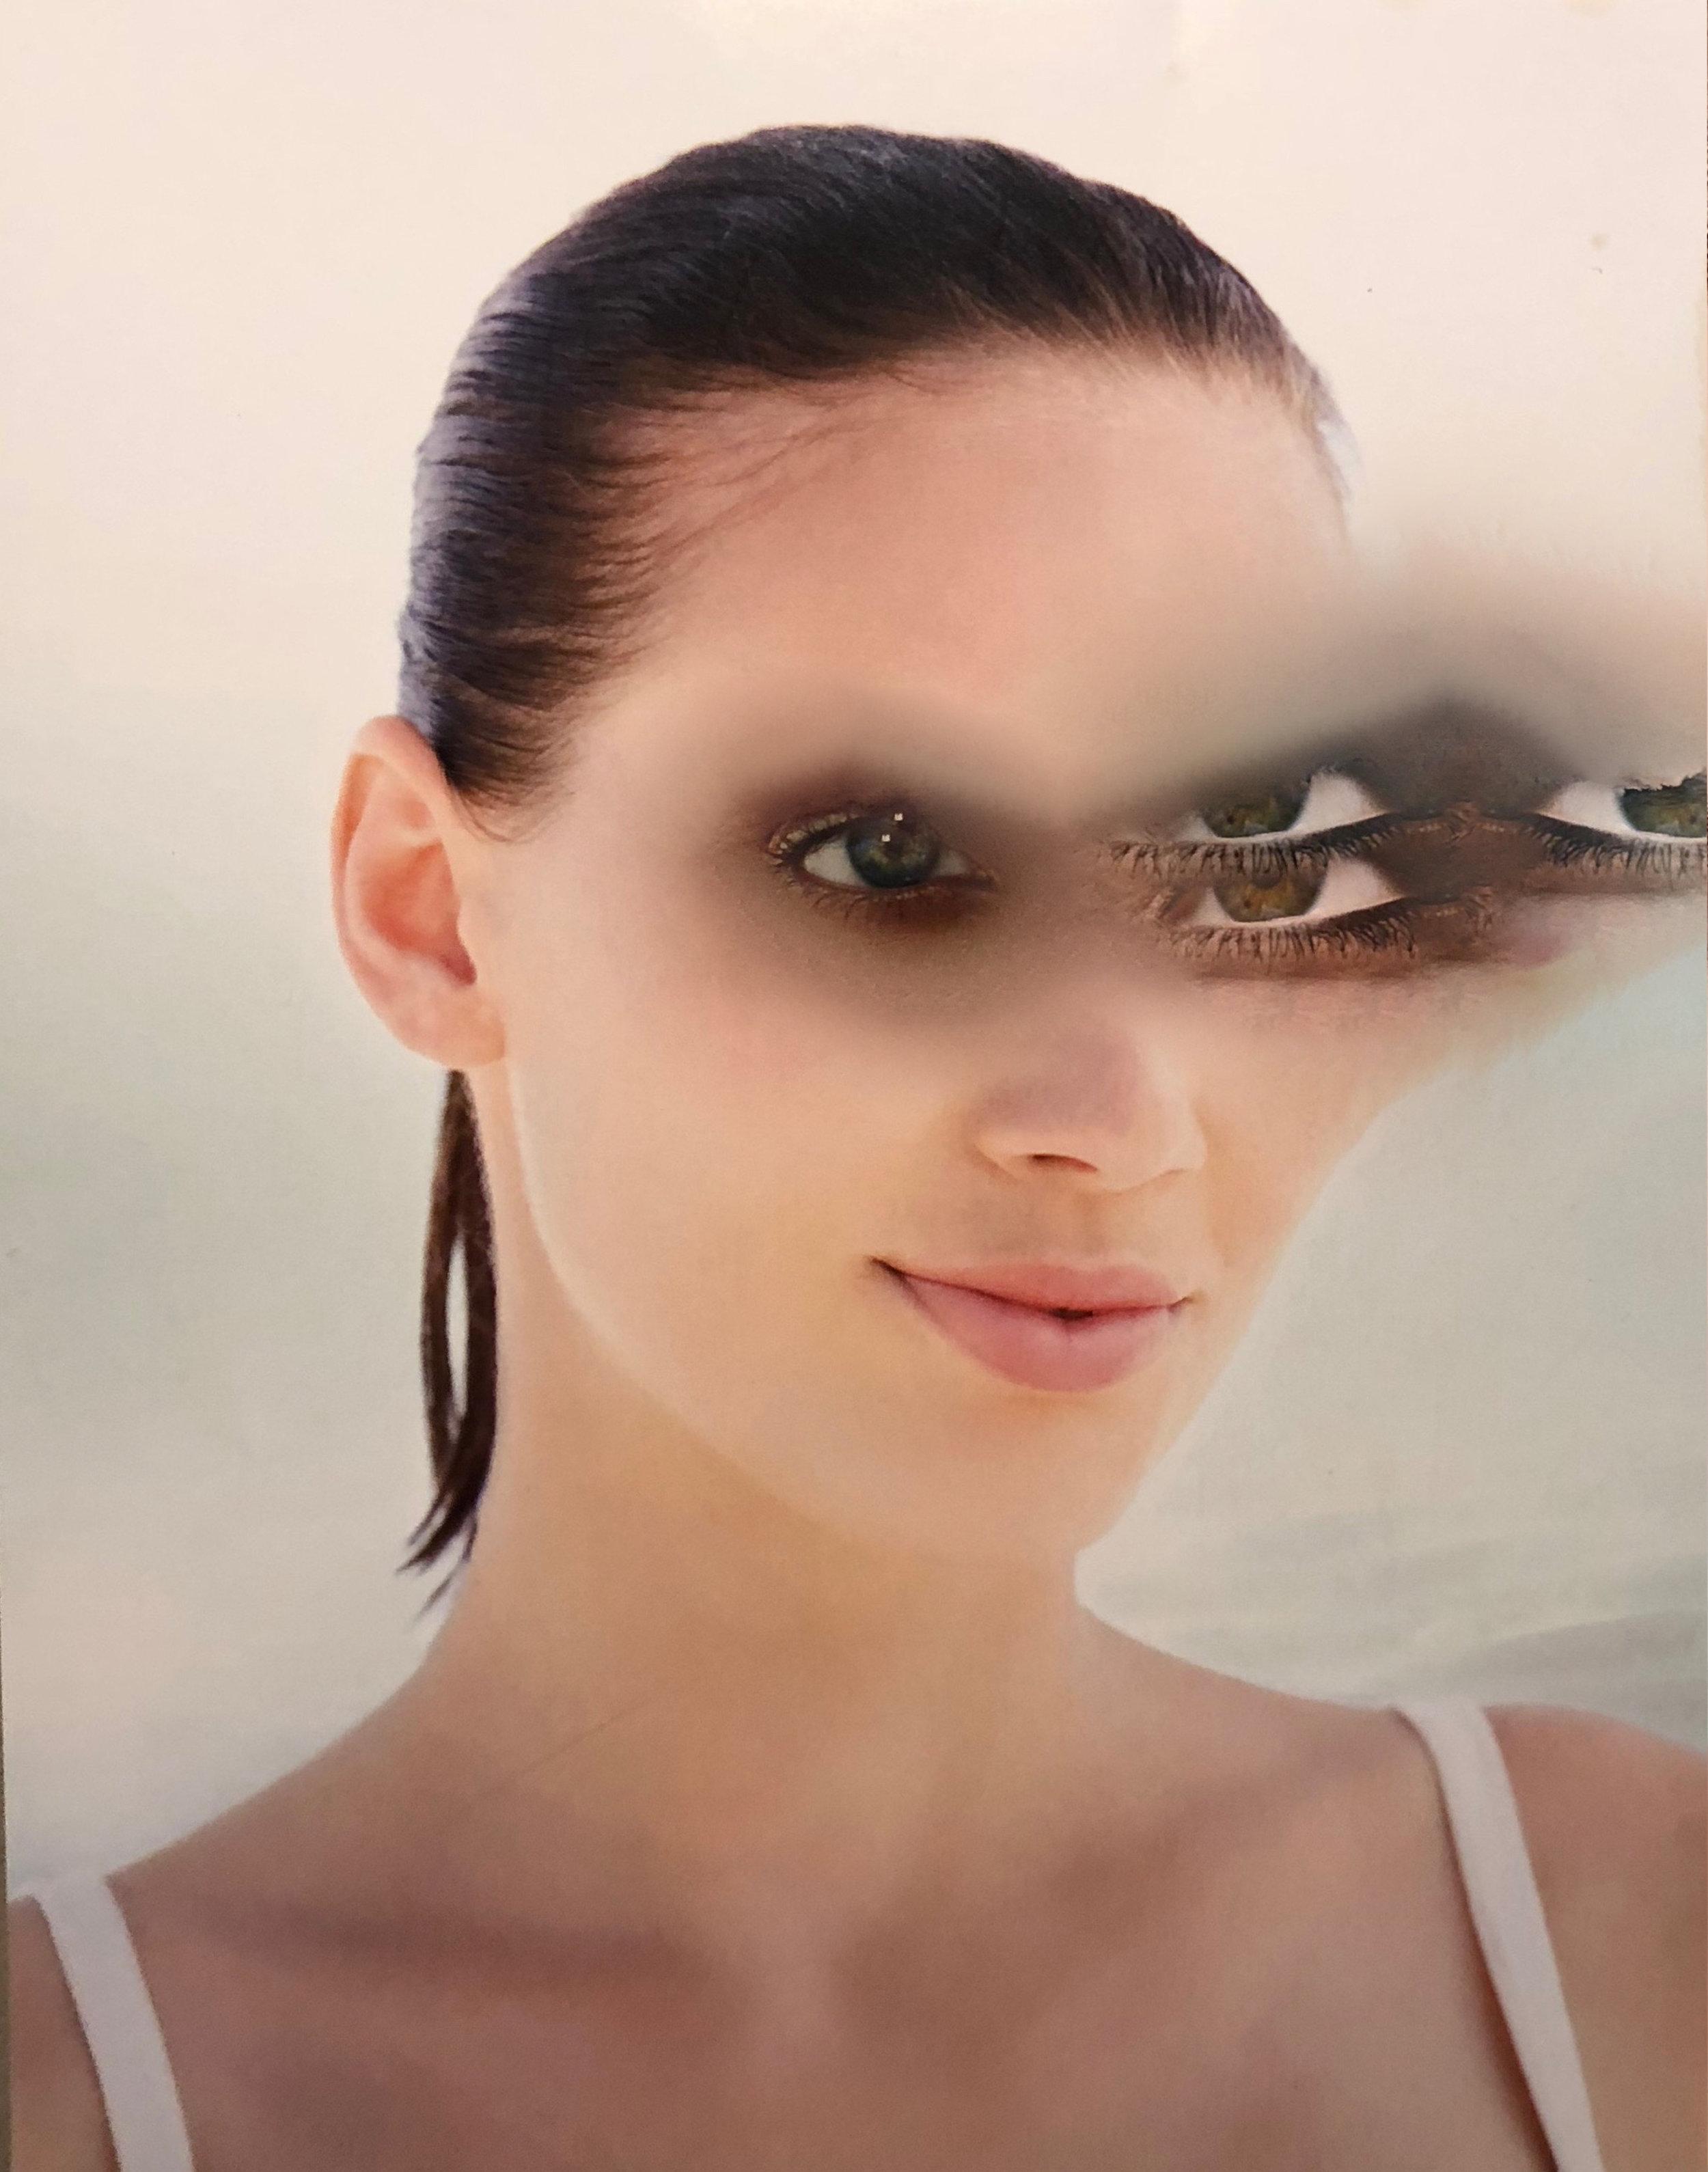 Enhanced Goddess 4 Reid Arowood Multiplatform Collage, 2018